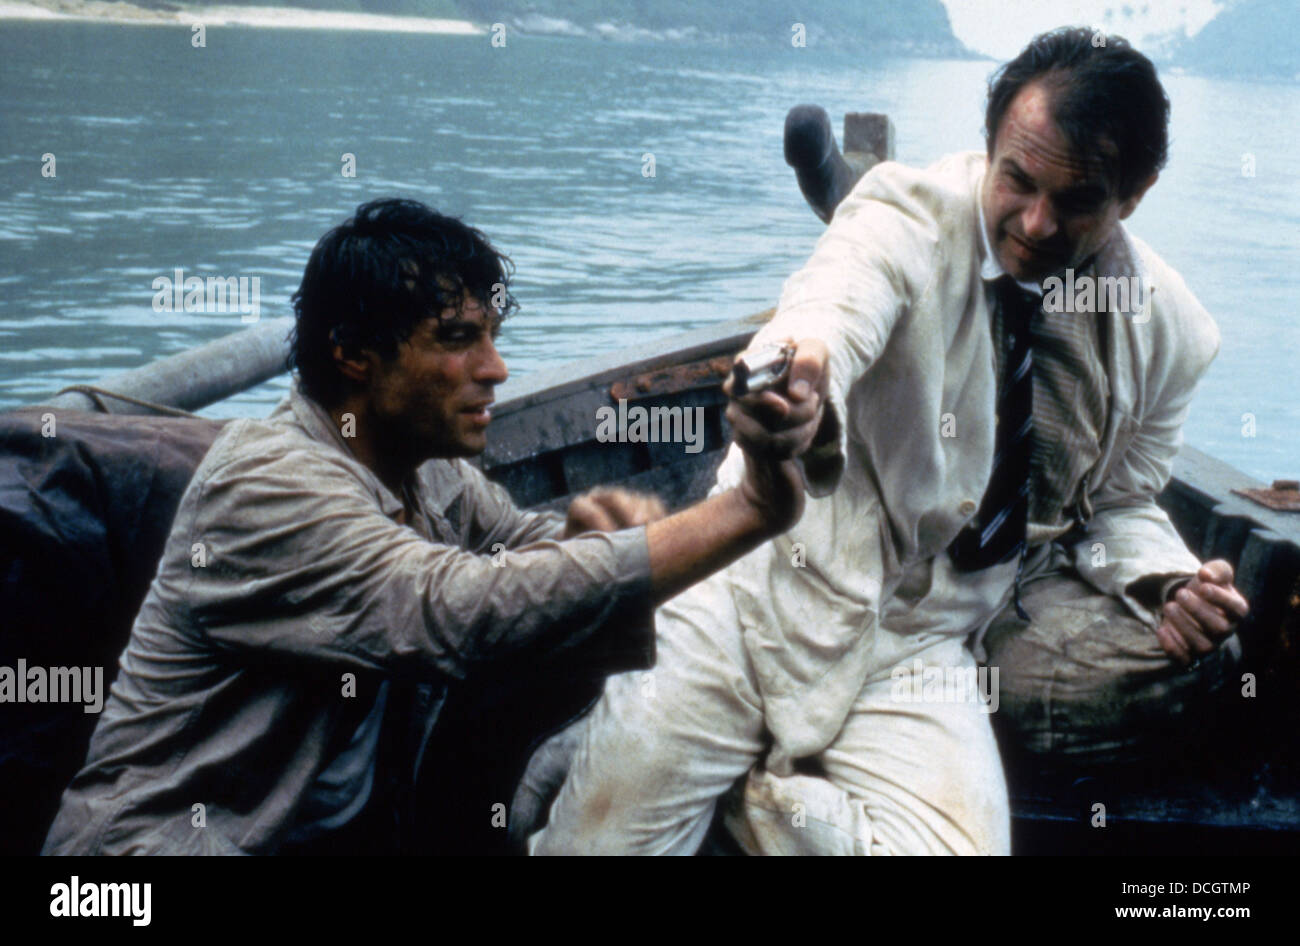 VICTORY (1996) FUGA PARA O AMOR (ALT) SAM NEILL, MARK PEPLOE (DIR) VTRY 002 MOVIESTORE COLLECTION LTD - Stock Image